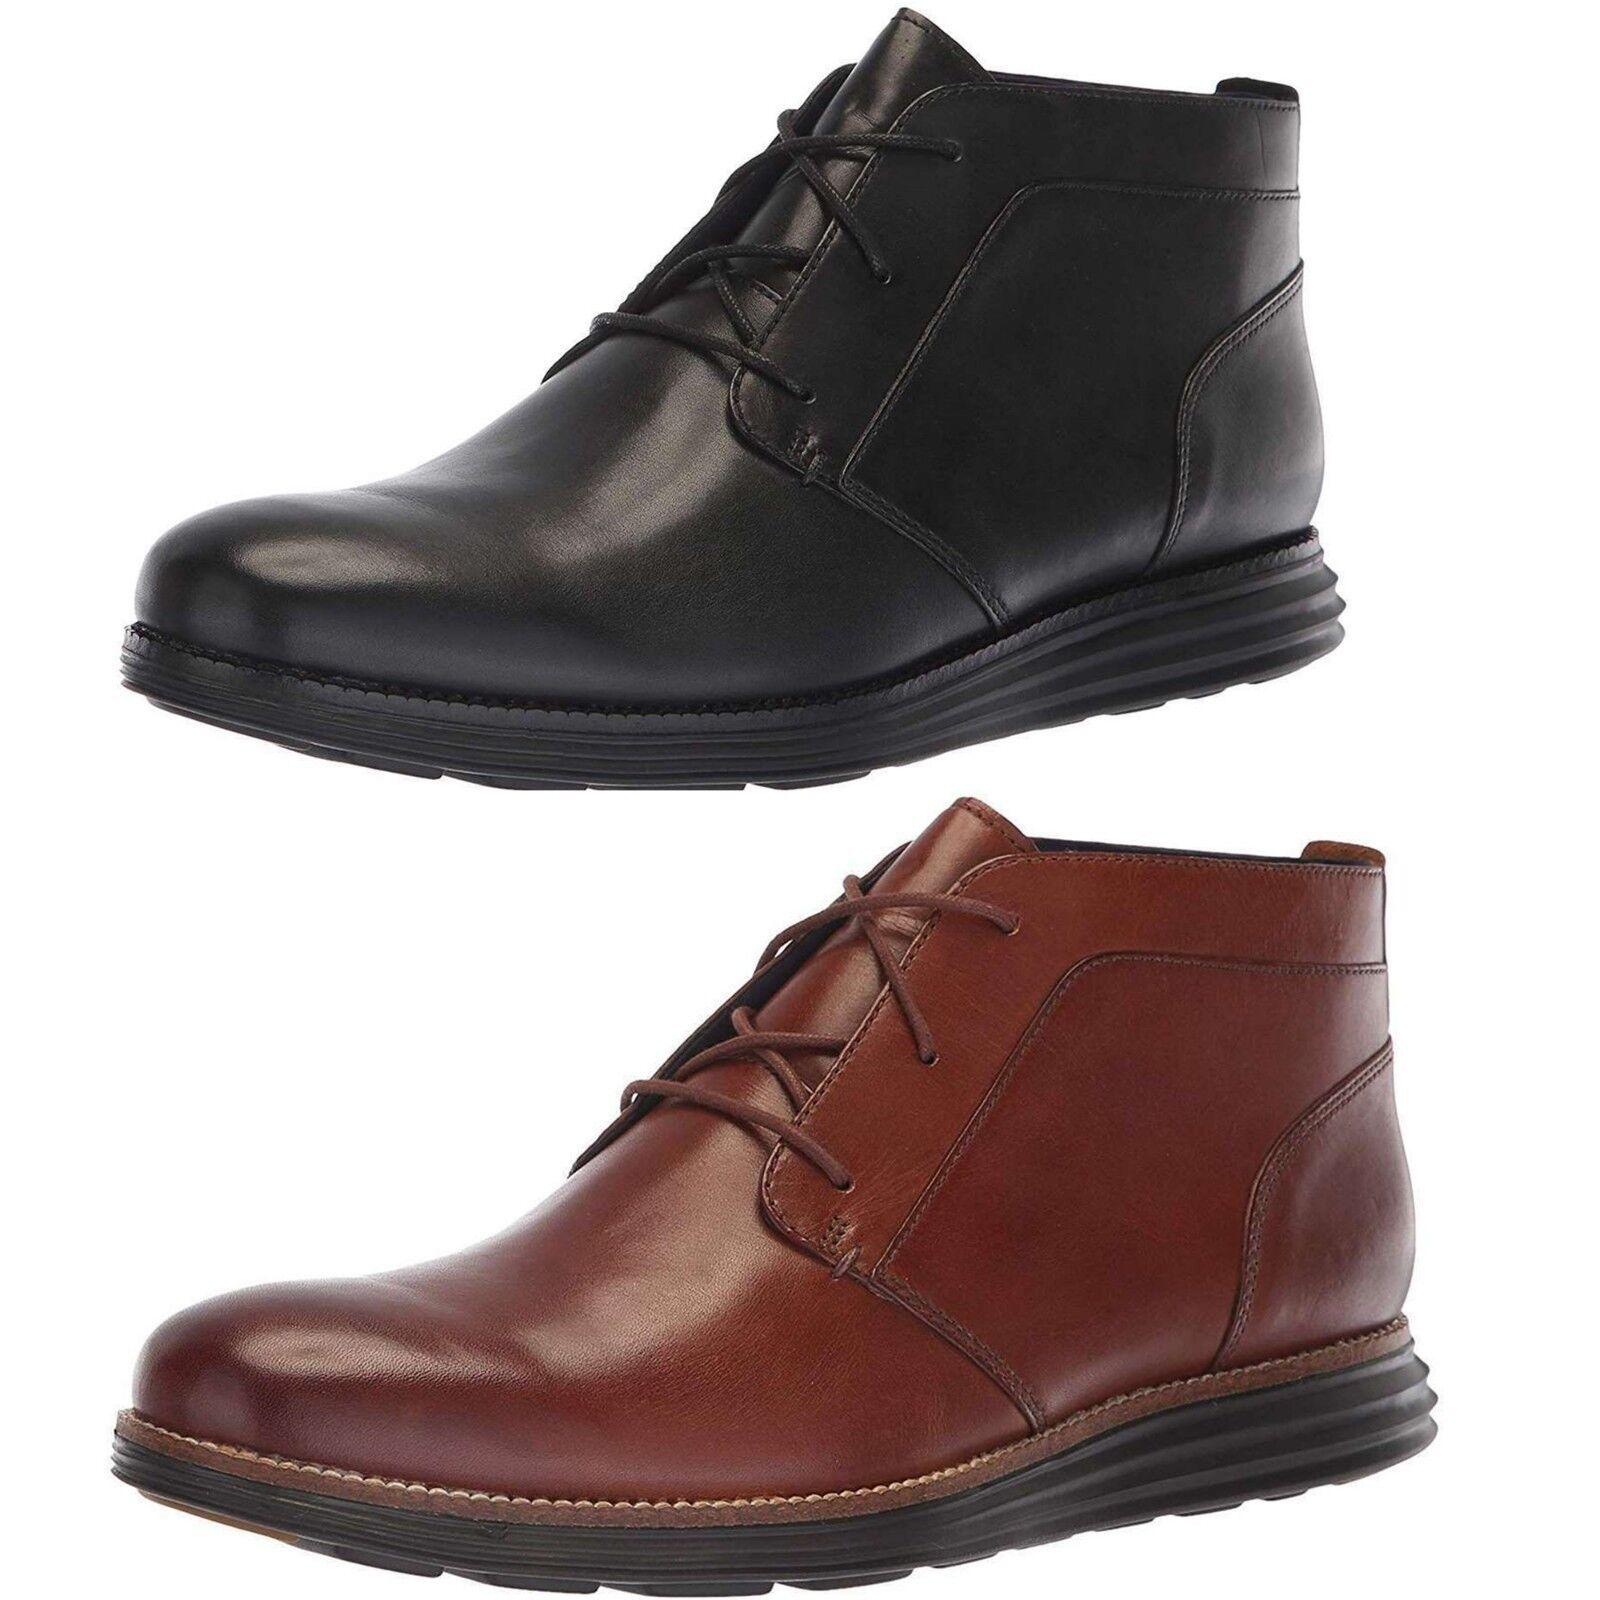 NEW Cole Haan Men OriginalGrand Chukka Boots Premium Leather Black Casual shoes